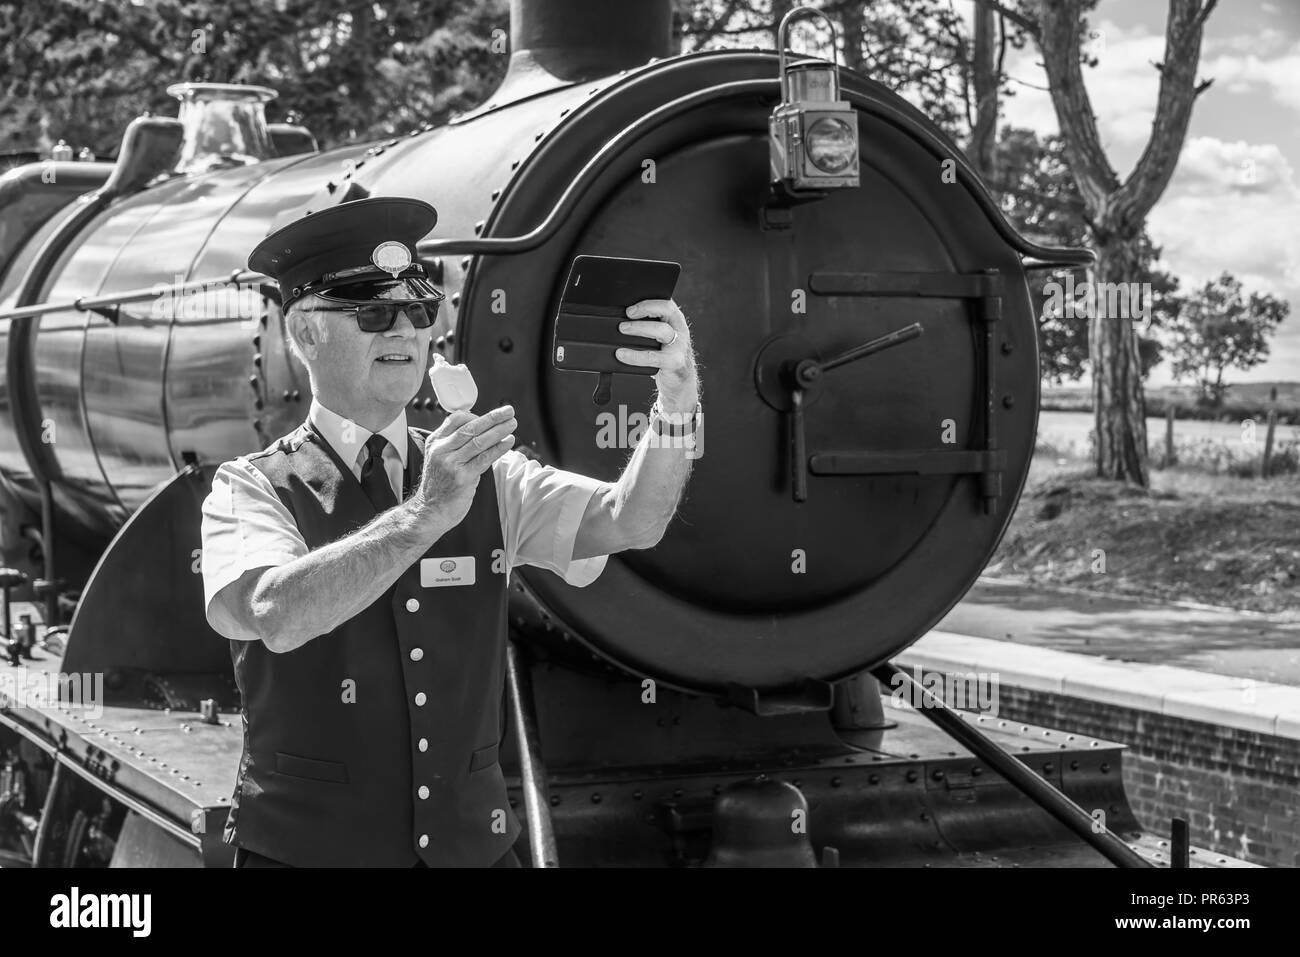 Gloucestershire Warwickshire Railway - Stock Image